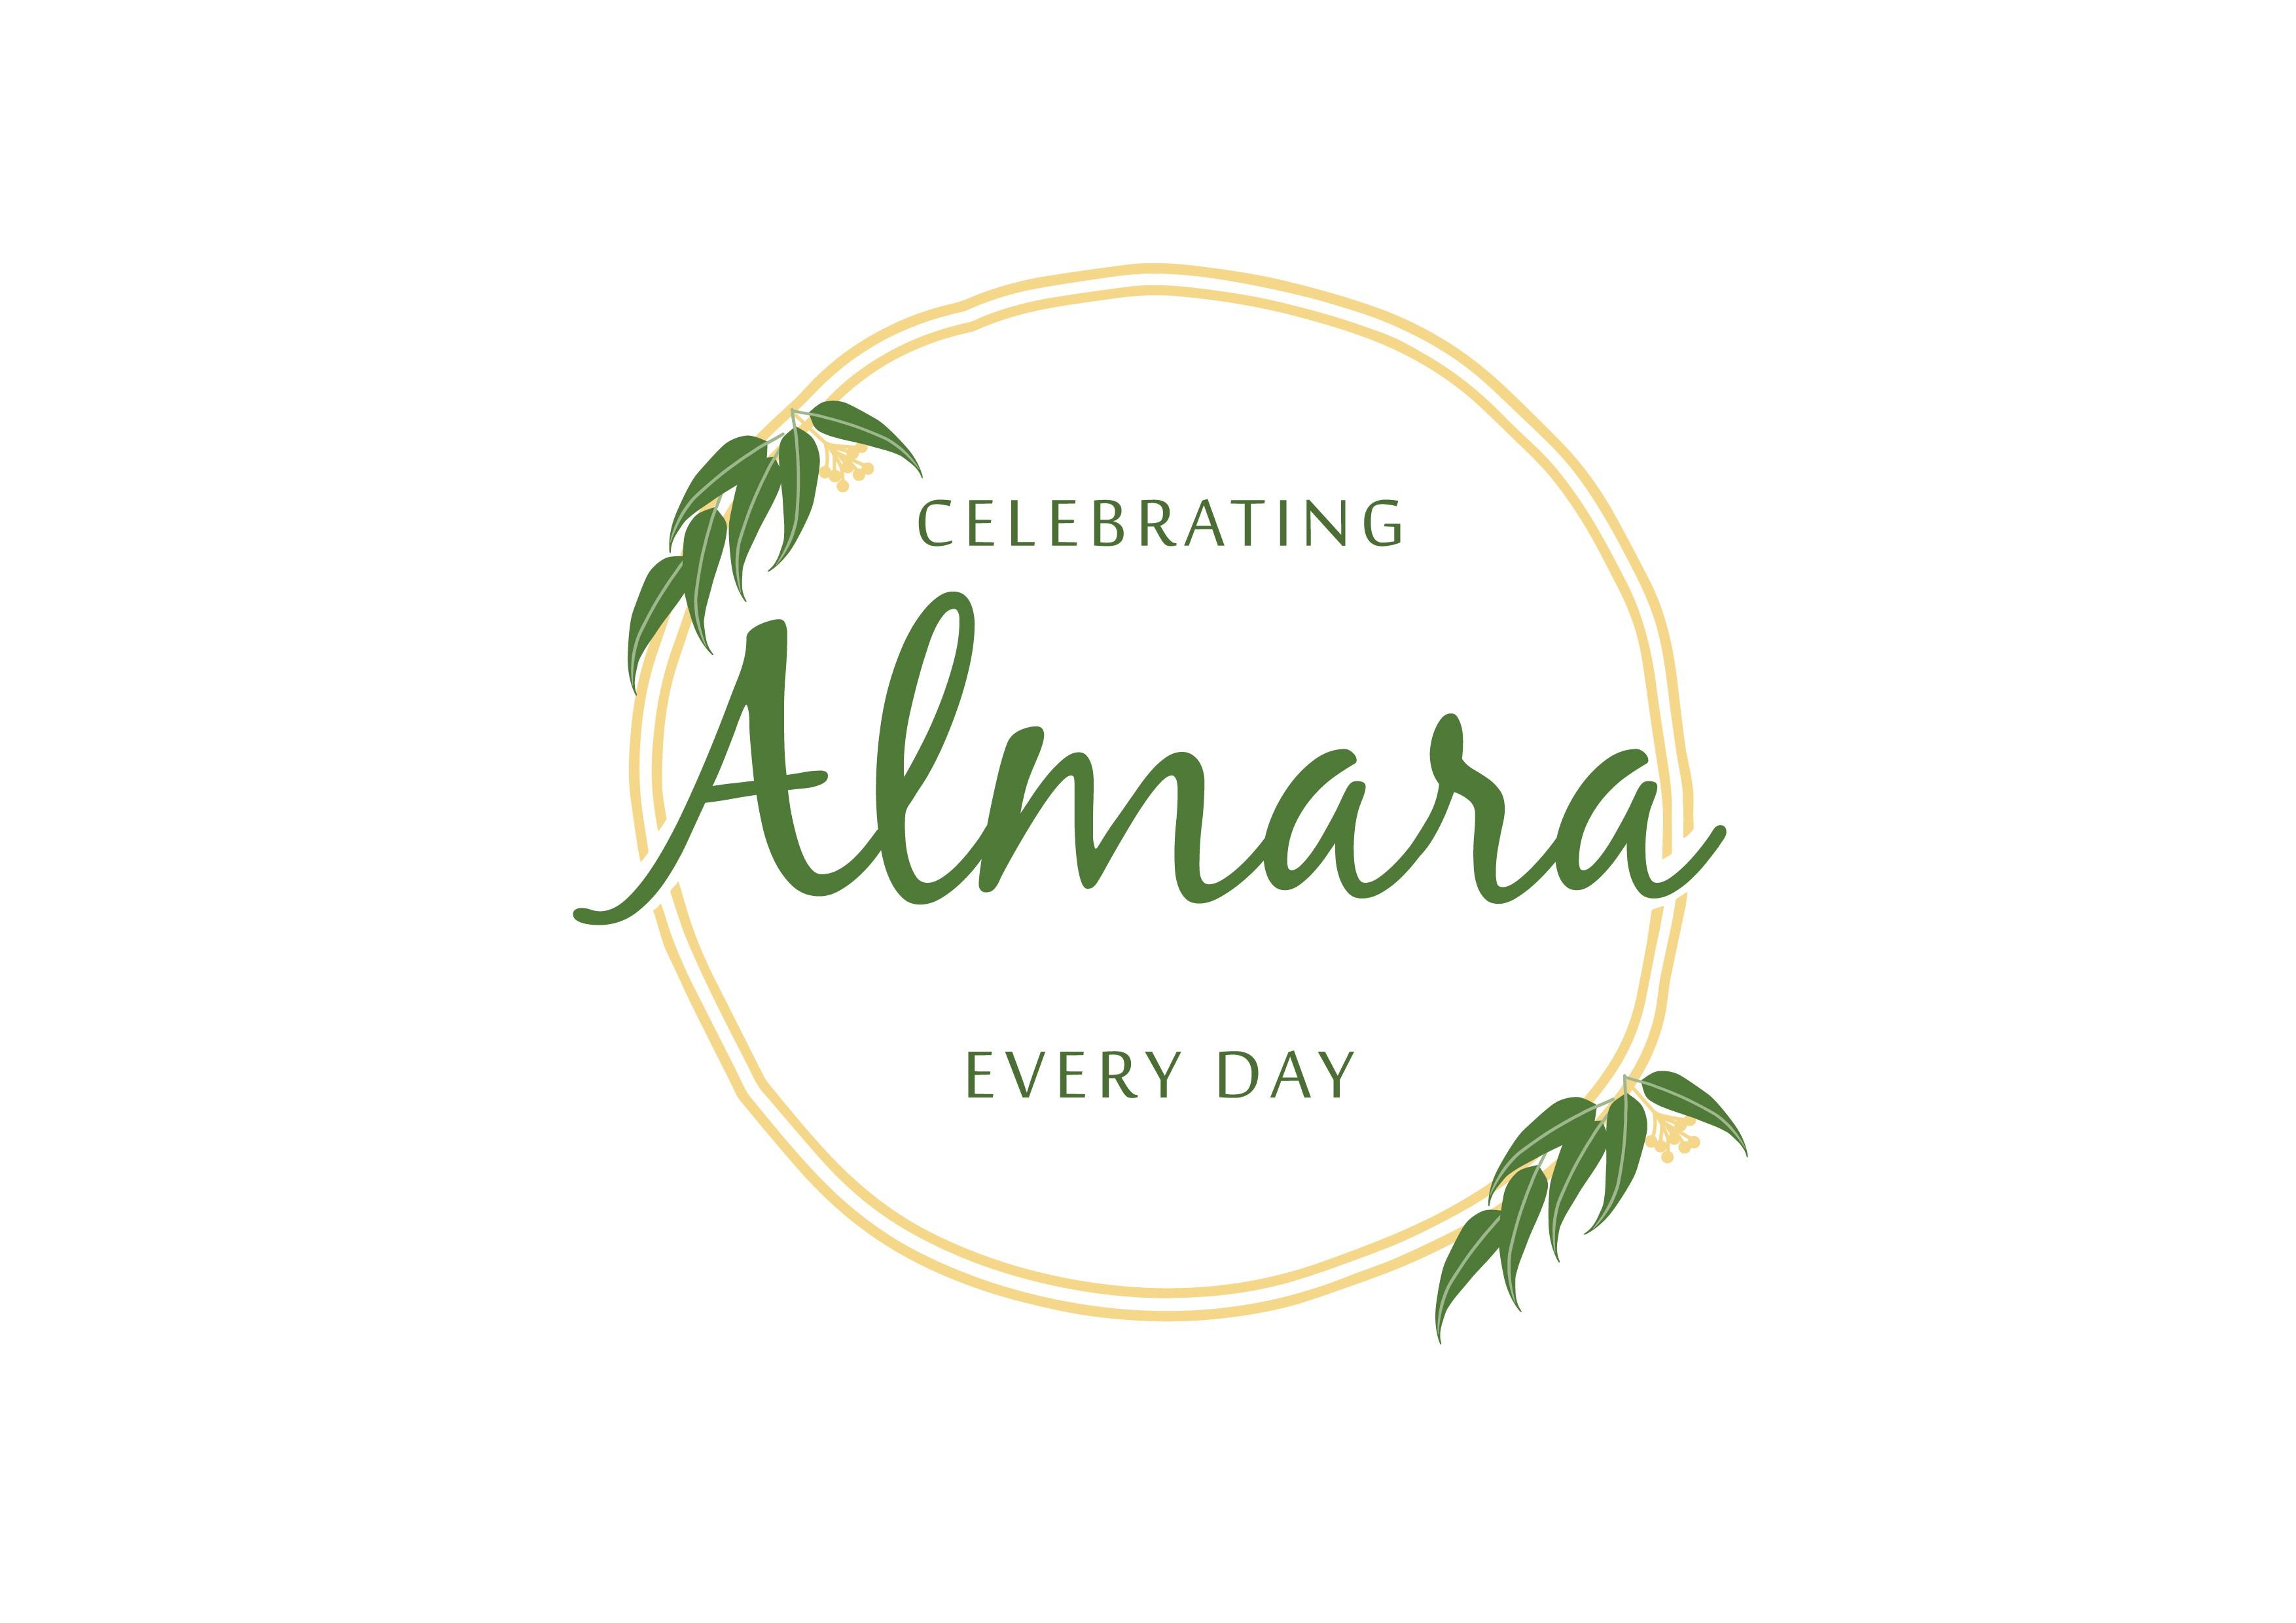 Celebratory, premium homeware gifts illustration for Almara required